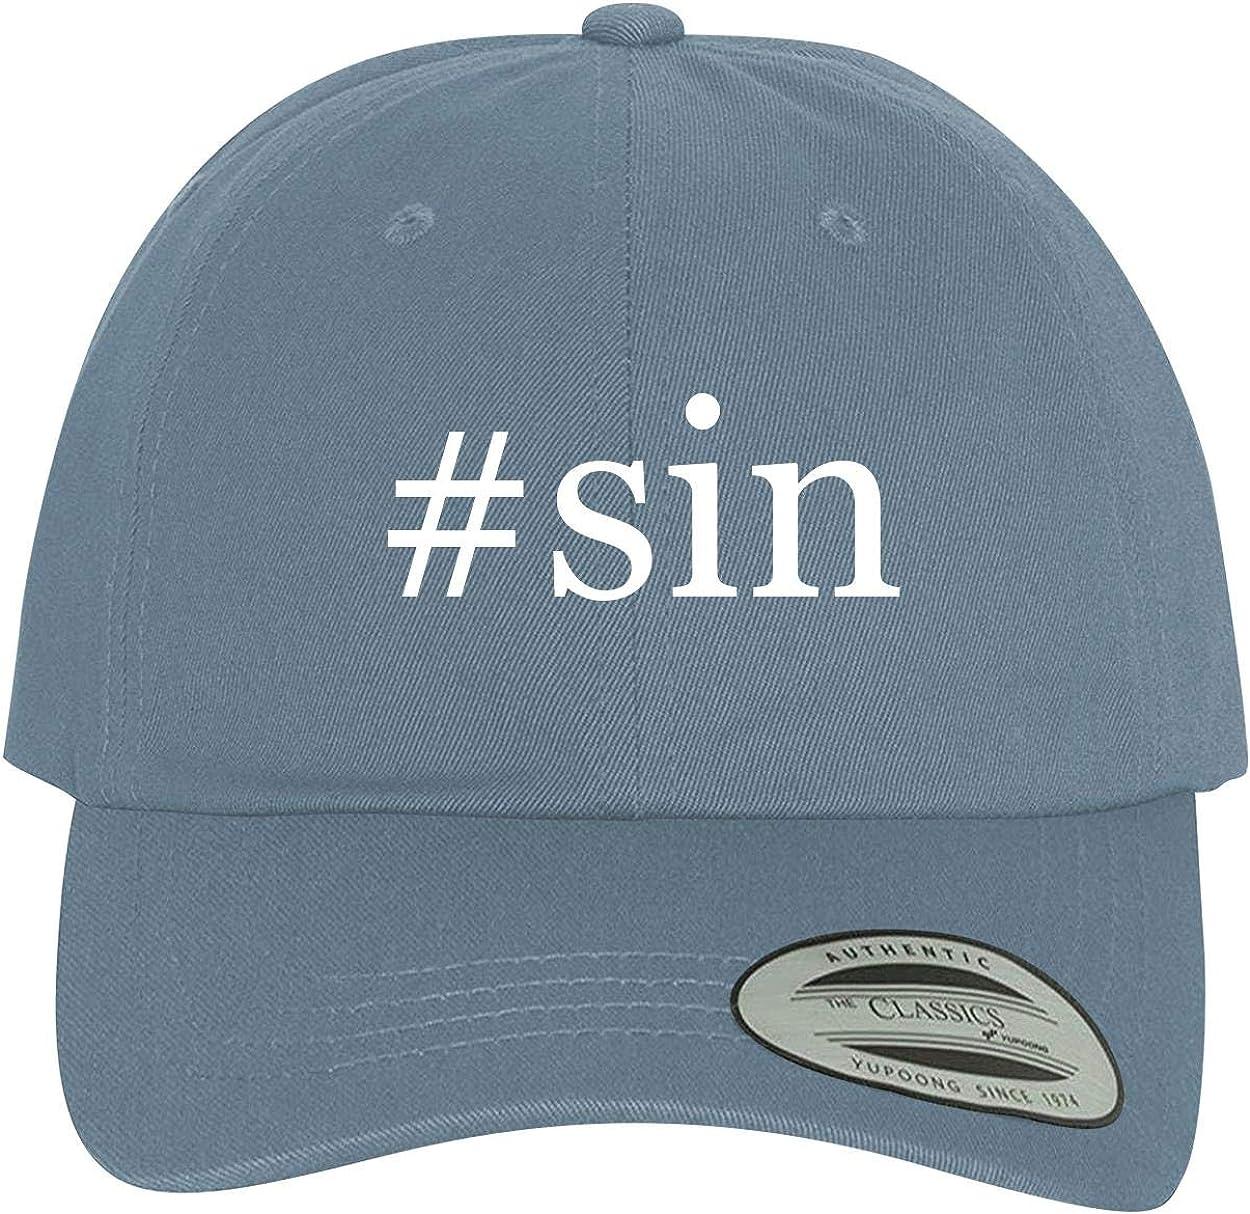 Comfortable Dad Hat Baseball Cap BH Cool Designs #sin